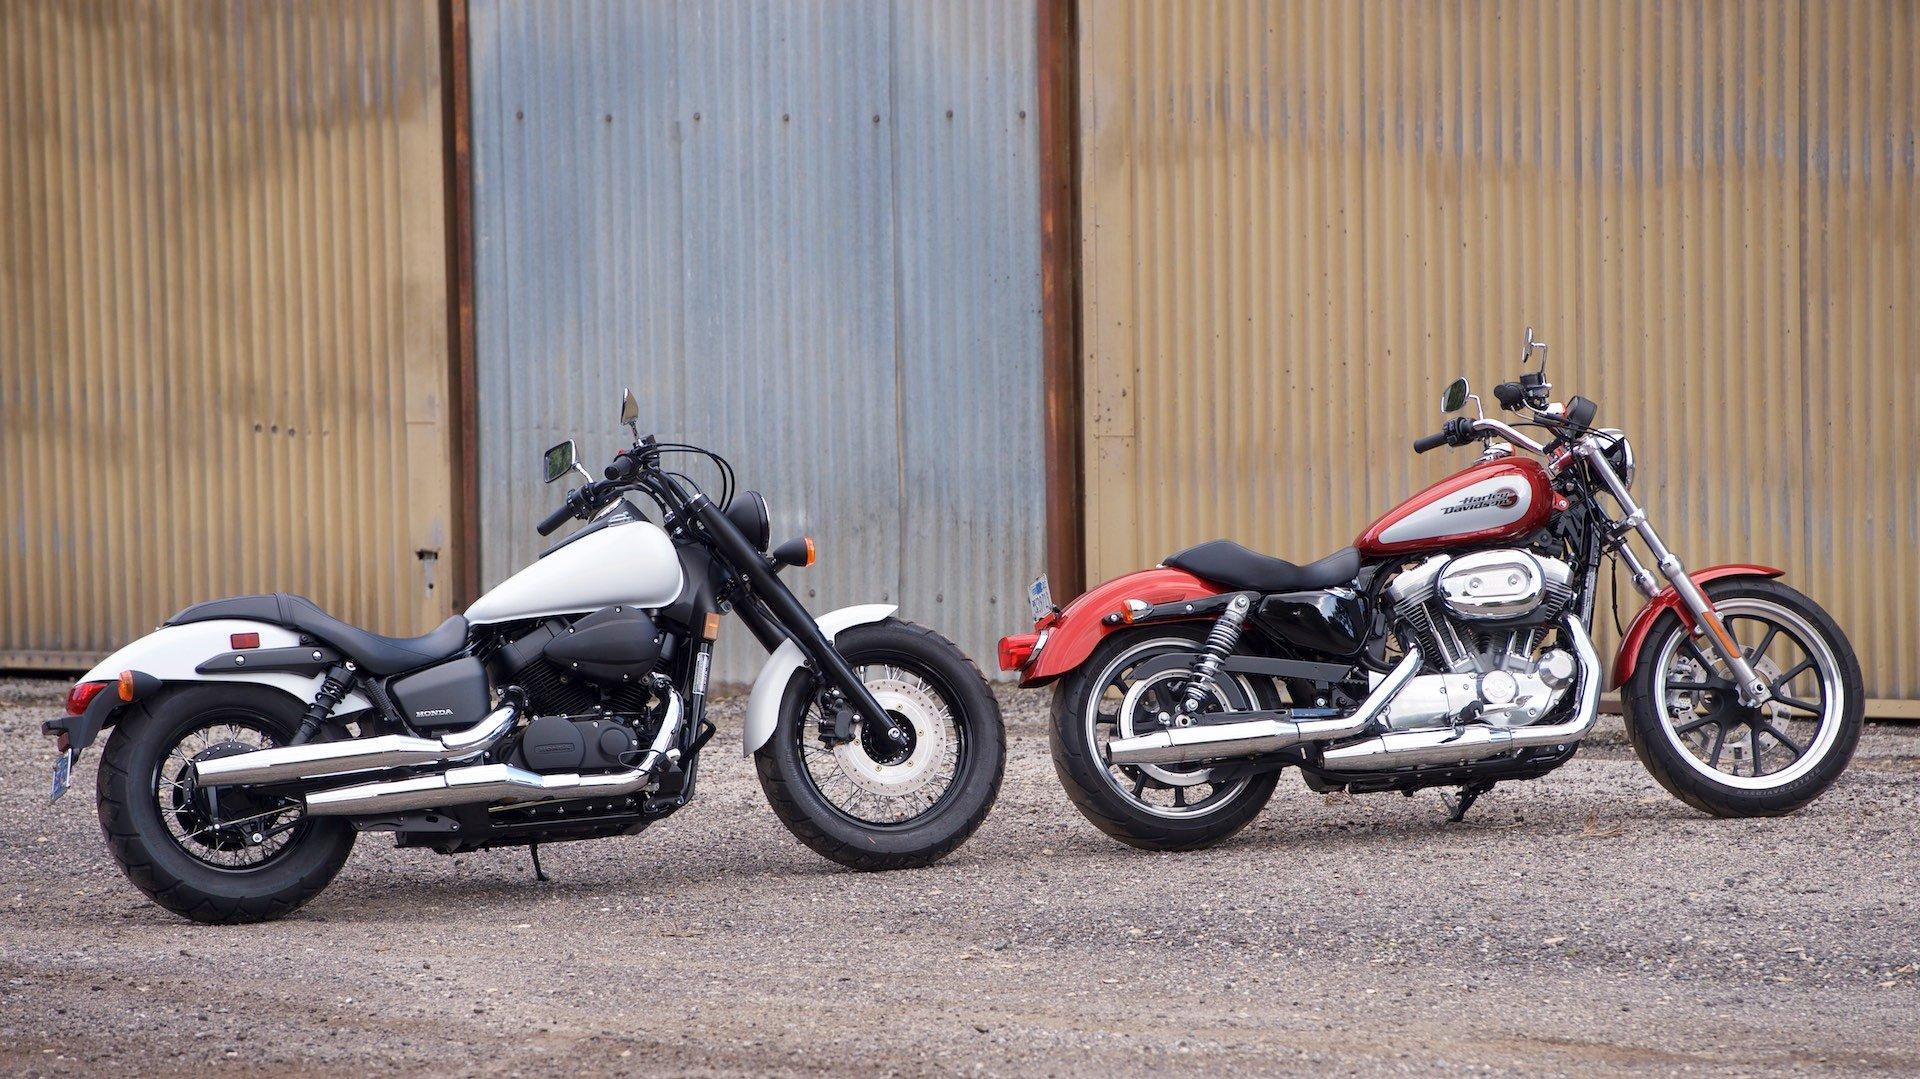 2019 Harley Sportster Superlow vs  2019 Honda Shadow Phantom